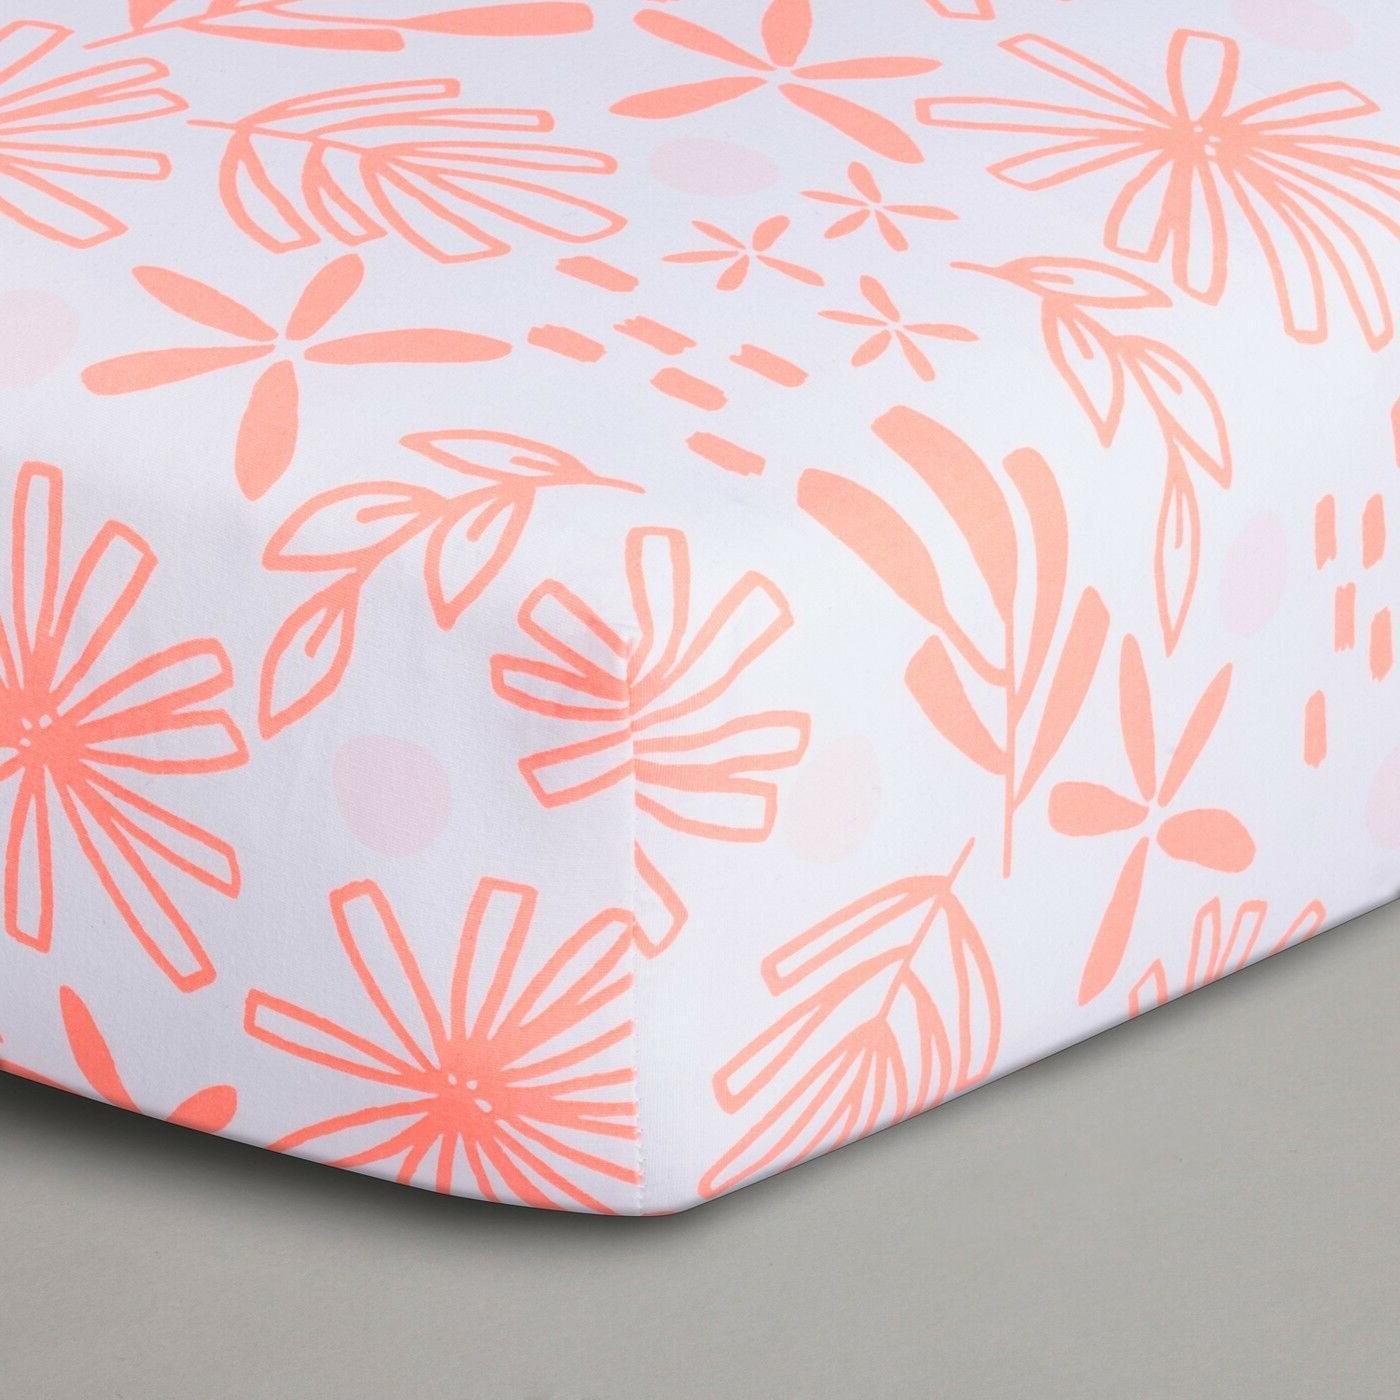 Cloud Island Coral/White Lemonade Baby Blanket & Crib Sheet Nwot